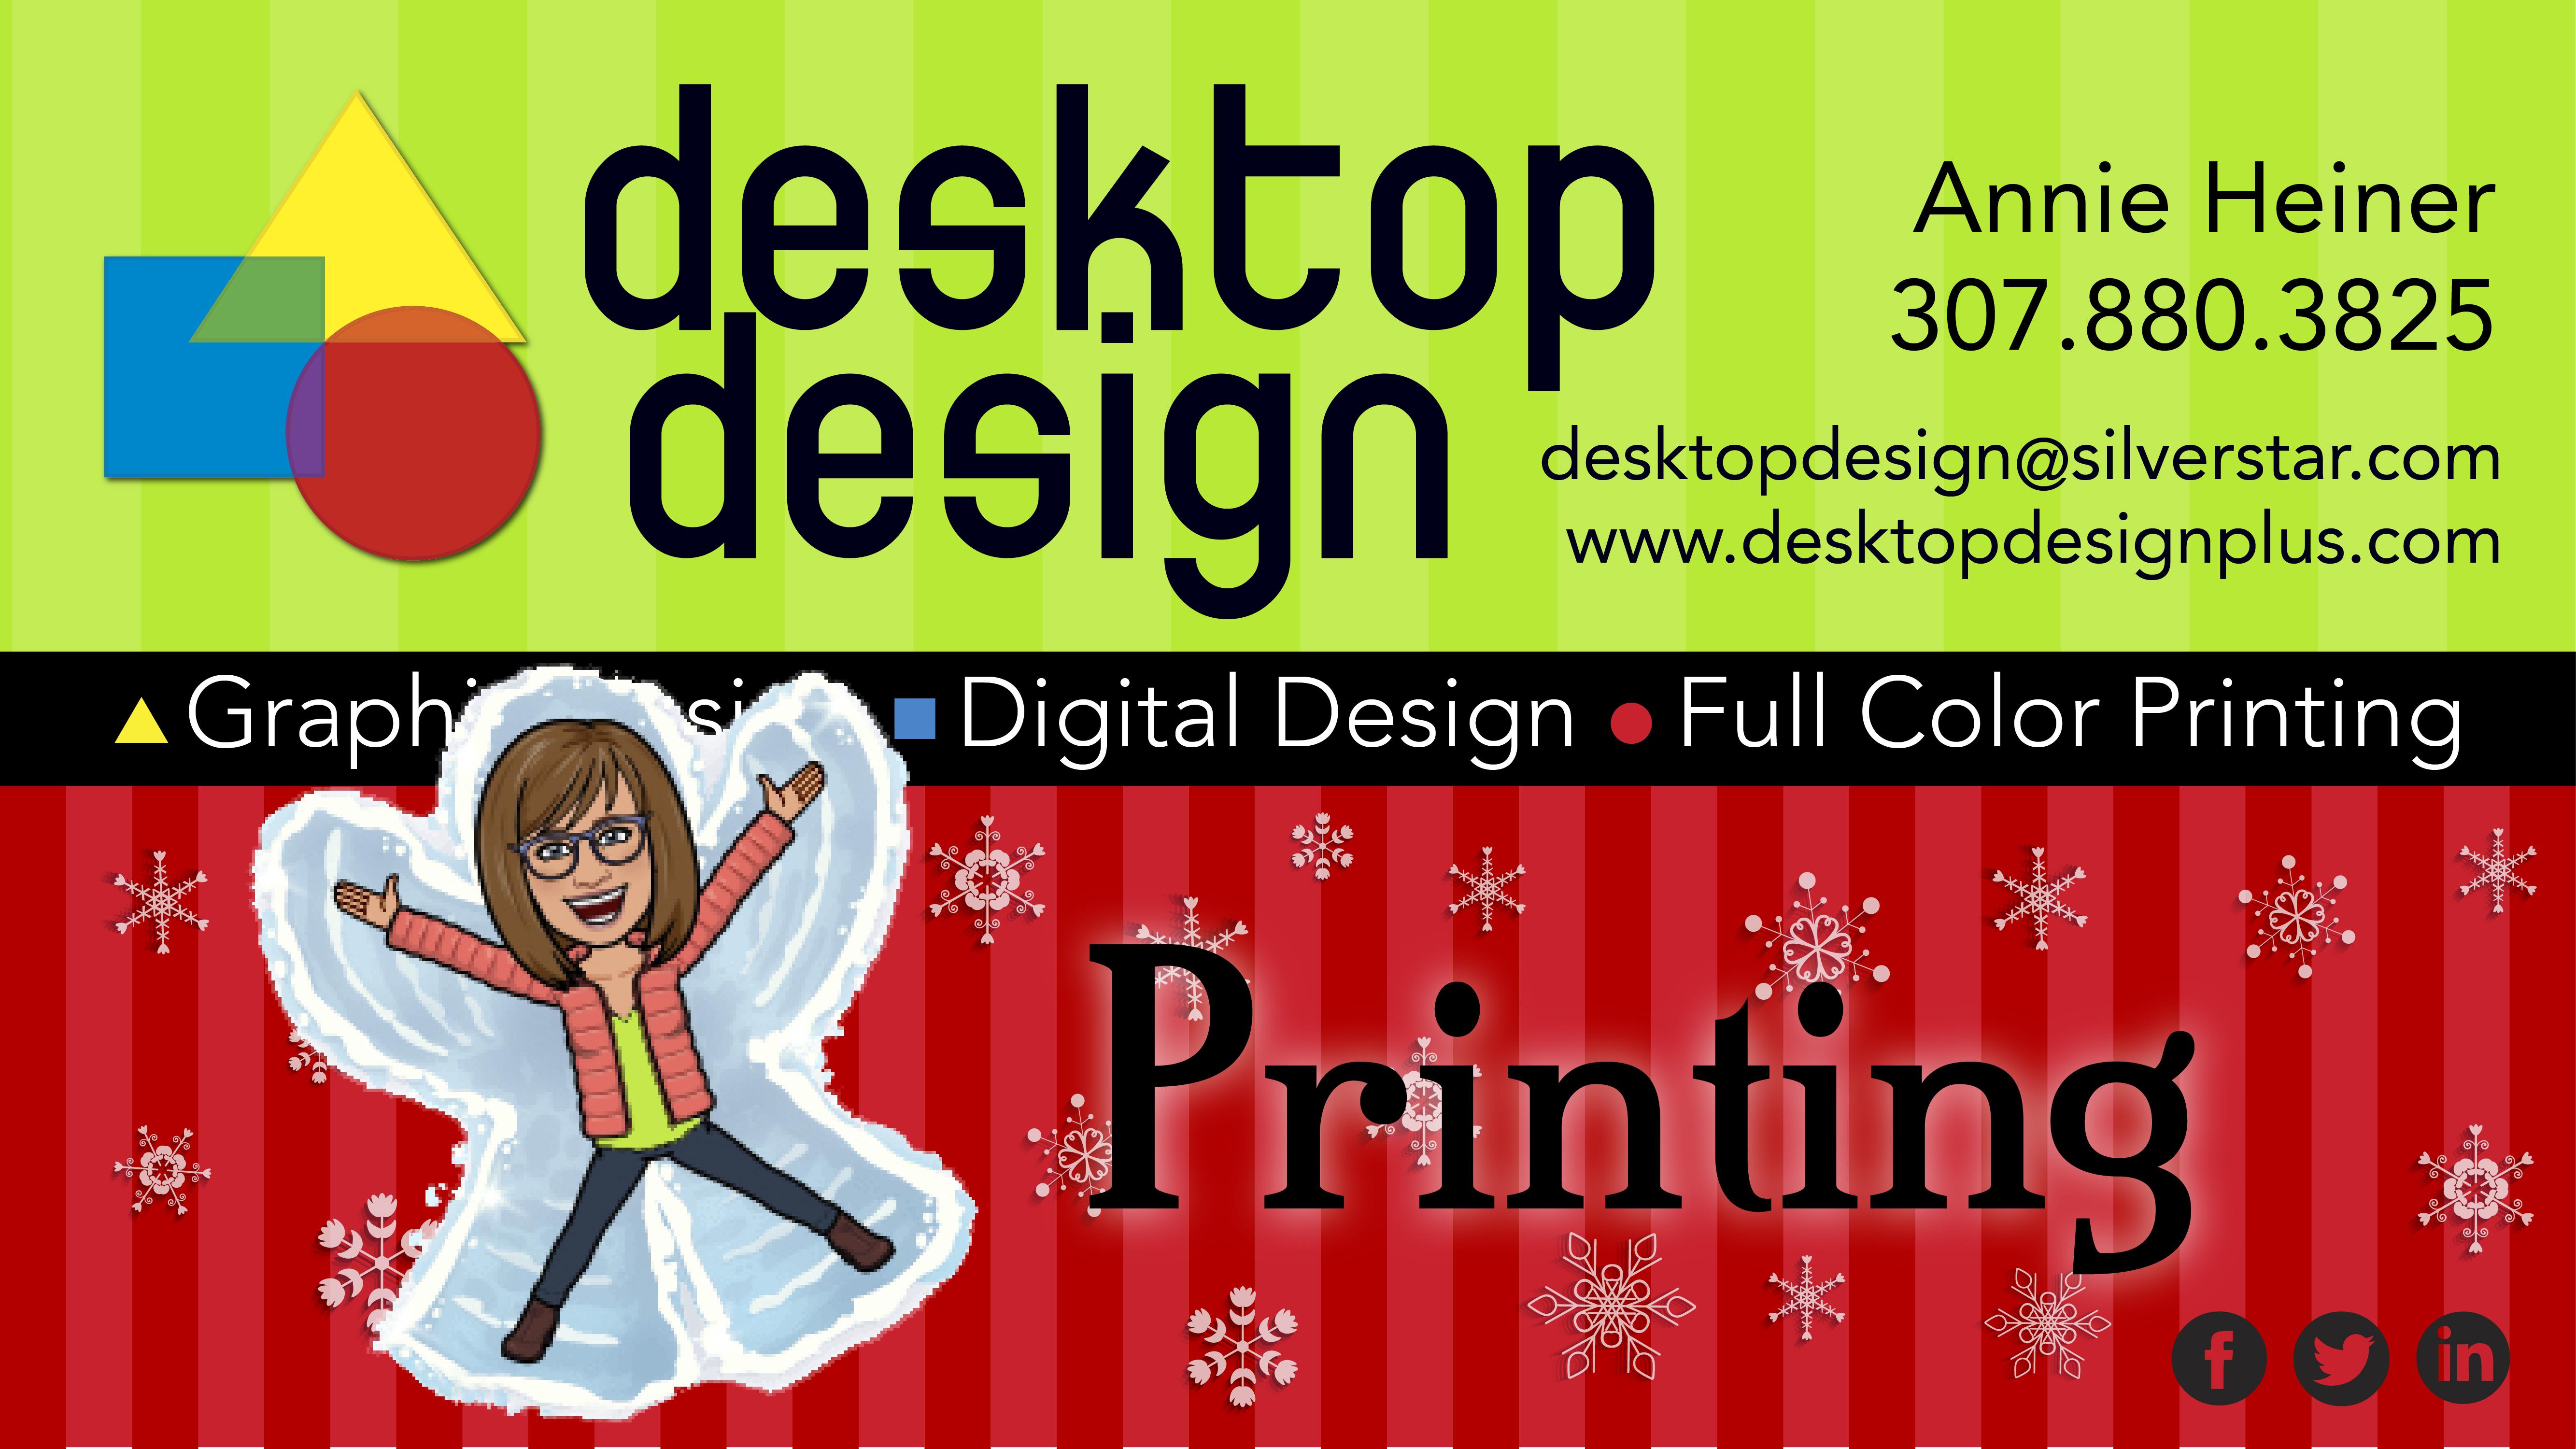 Desktop Design 12-19-03